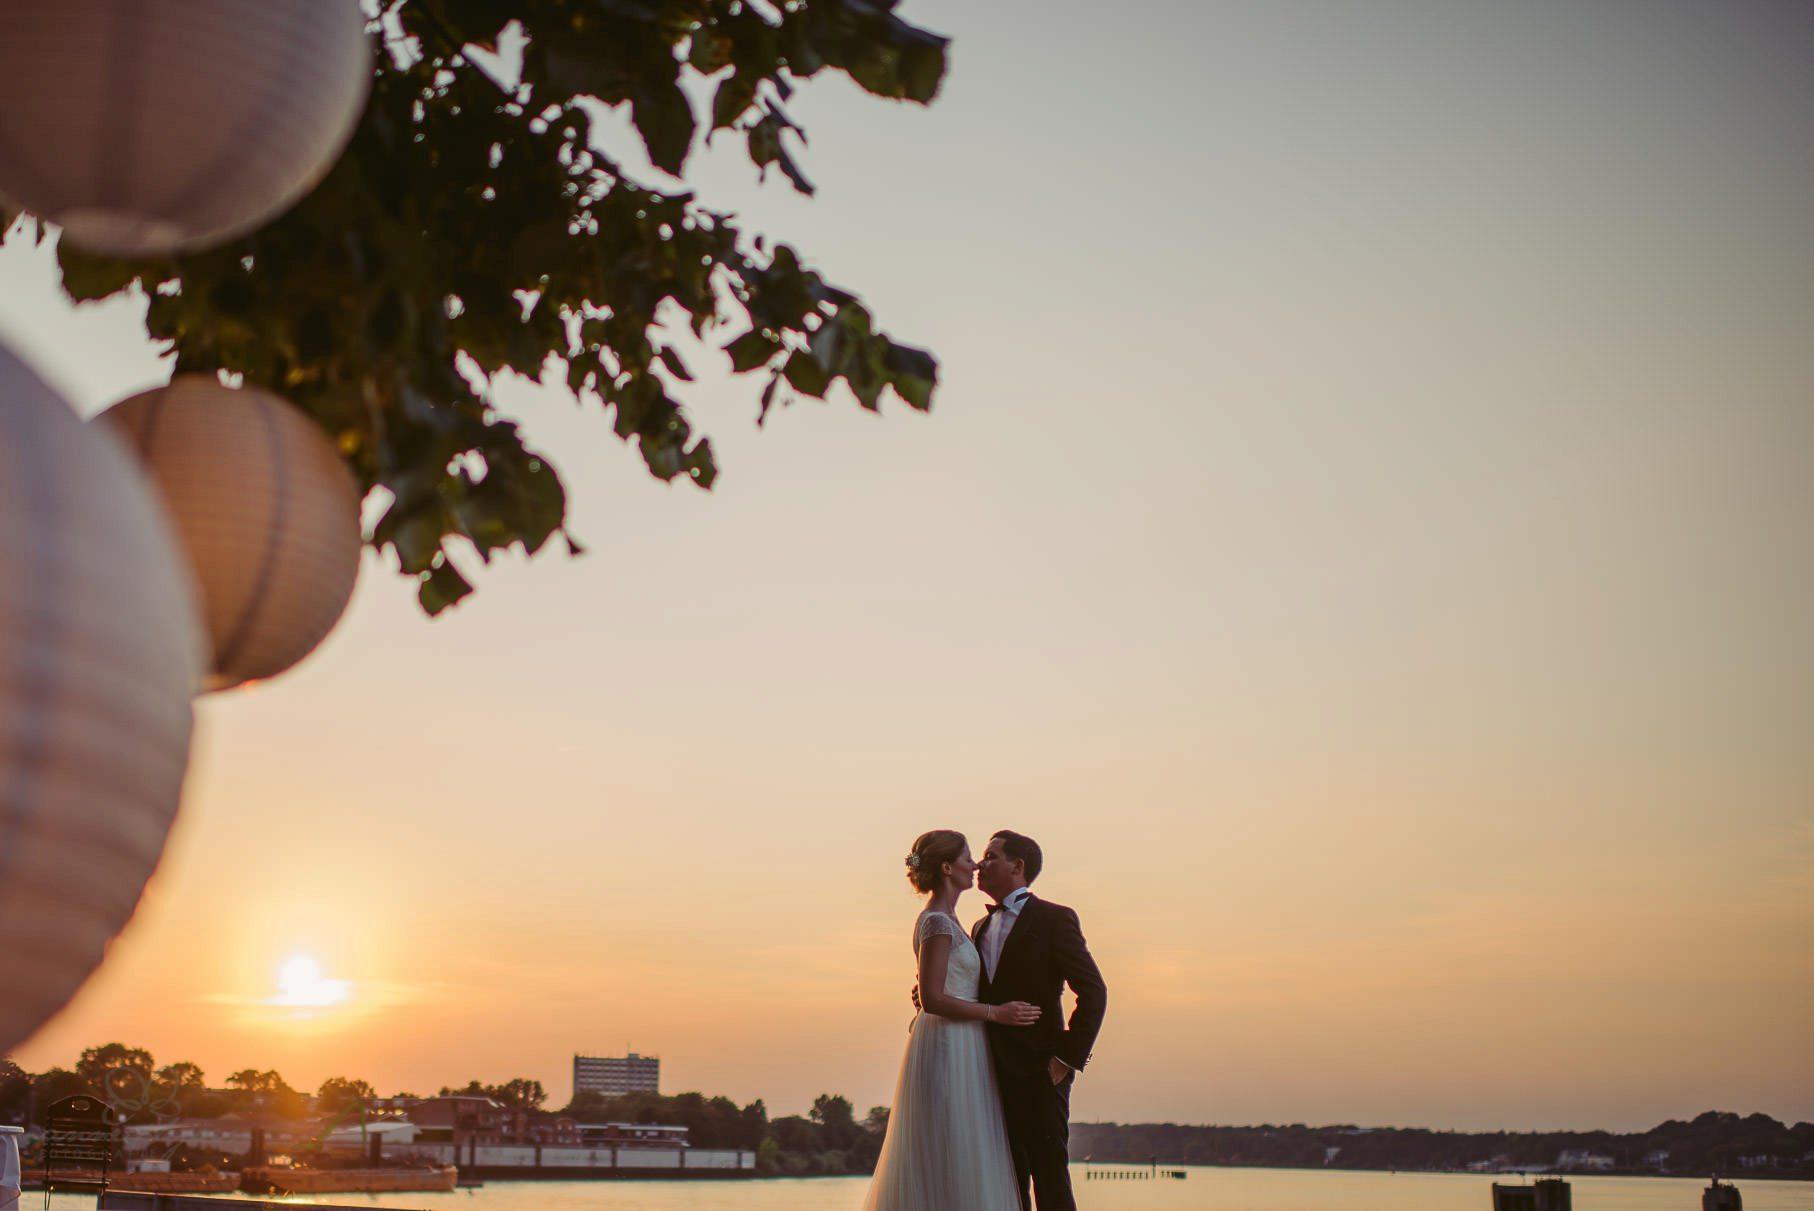 0094 aud blog d75 3125 - Hochzeit an der Hamburger Elbe - Ann-Katrin & Daniel